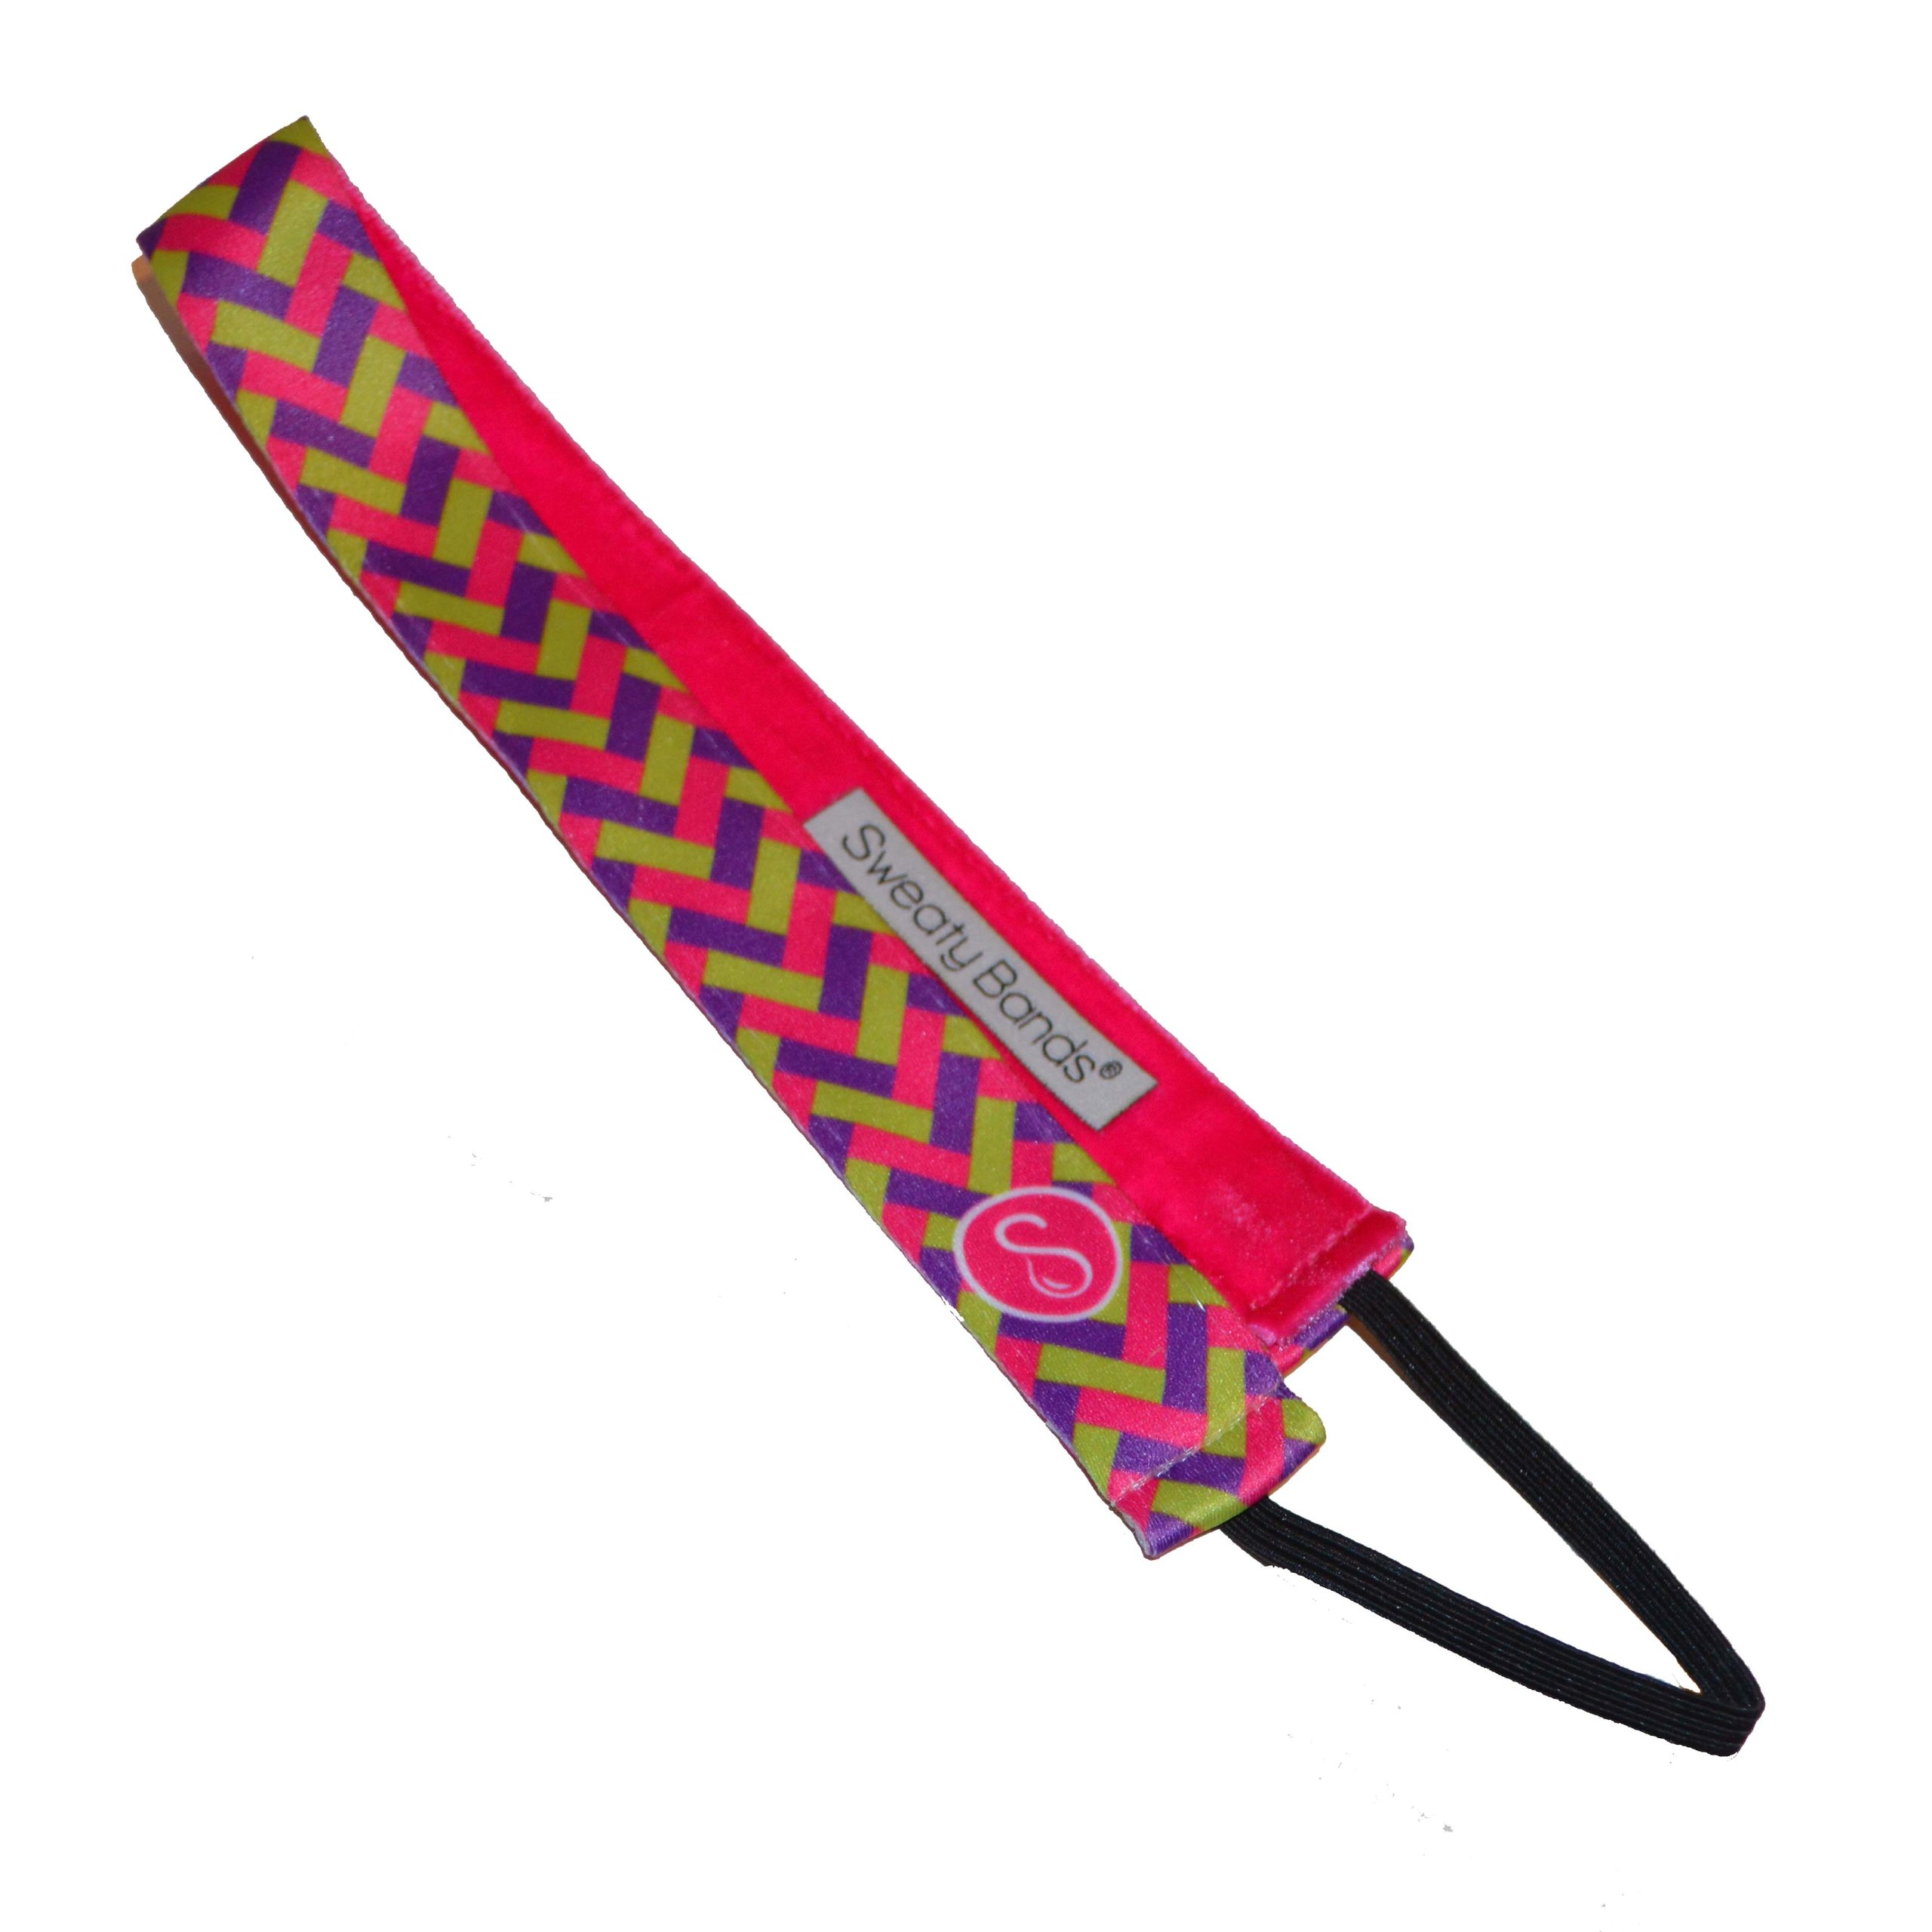 Sweaty Bands - Exclusive Sweatys !!! - #1 Fitness Headband! (Basket Weave - 1'' Pink Green and Purple)